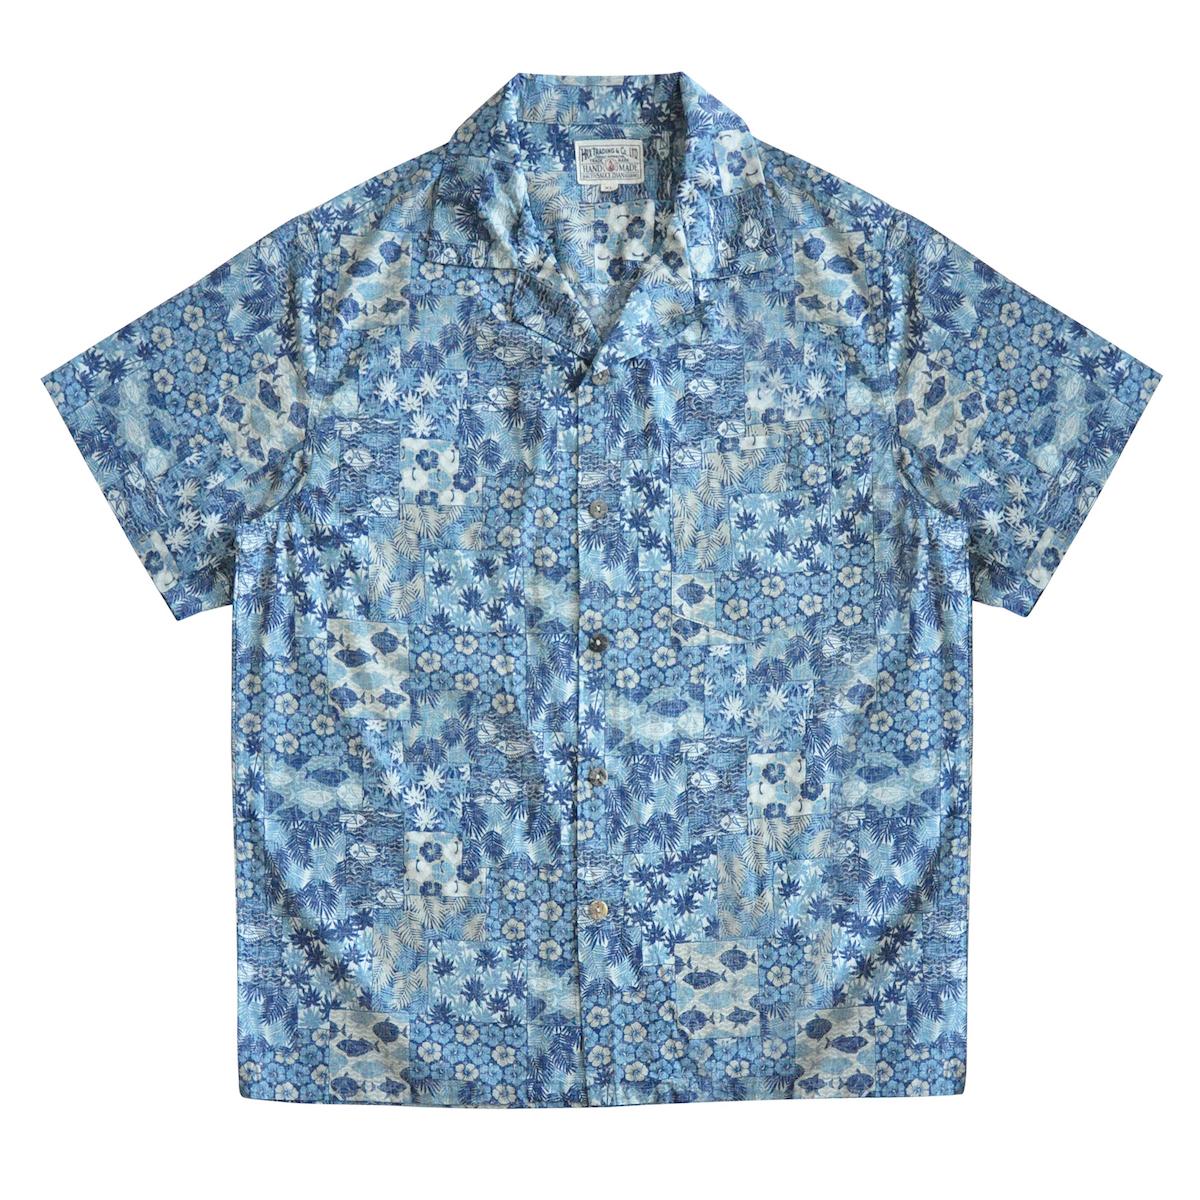 Sauce Zhan Mens Hawaiian Shirt Men's Casual Shirt Japanese Fabric Printed Beach Men's Short Sleeve Shirt